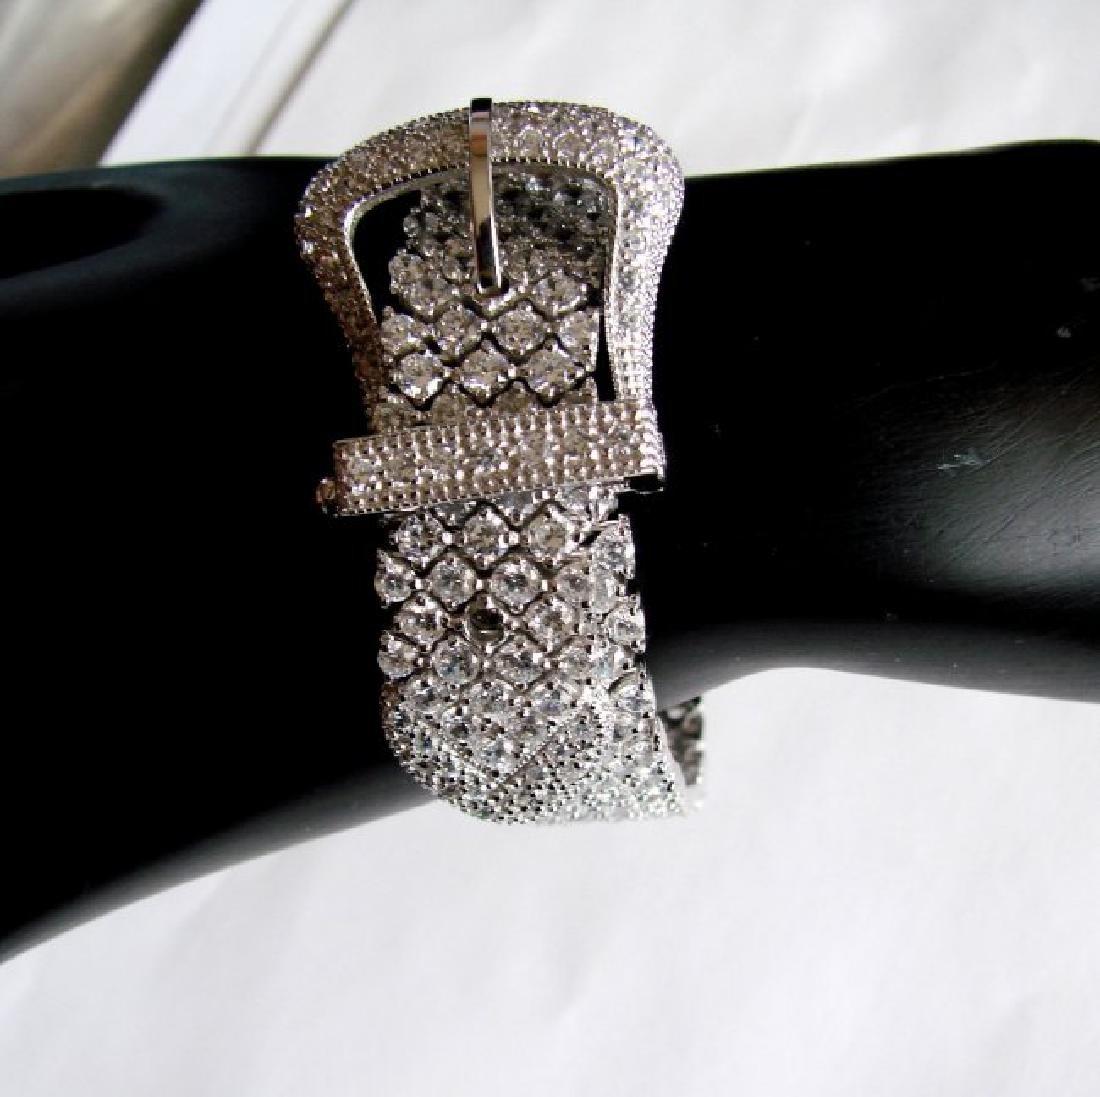 Bracelet Creation Diamond 47.91Ct 18k W/g Overlay - 3